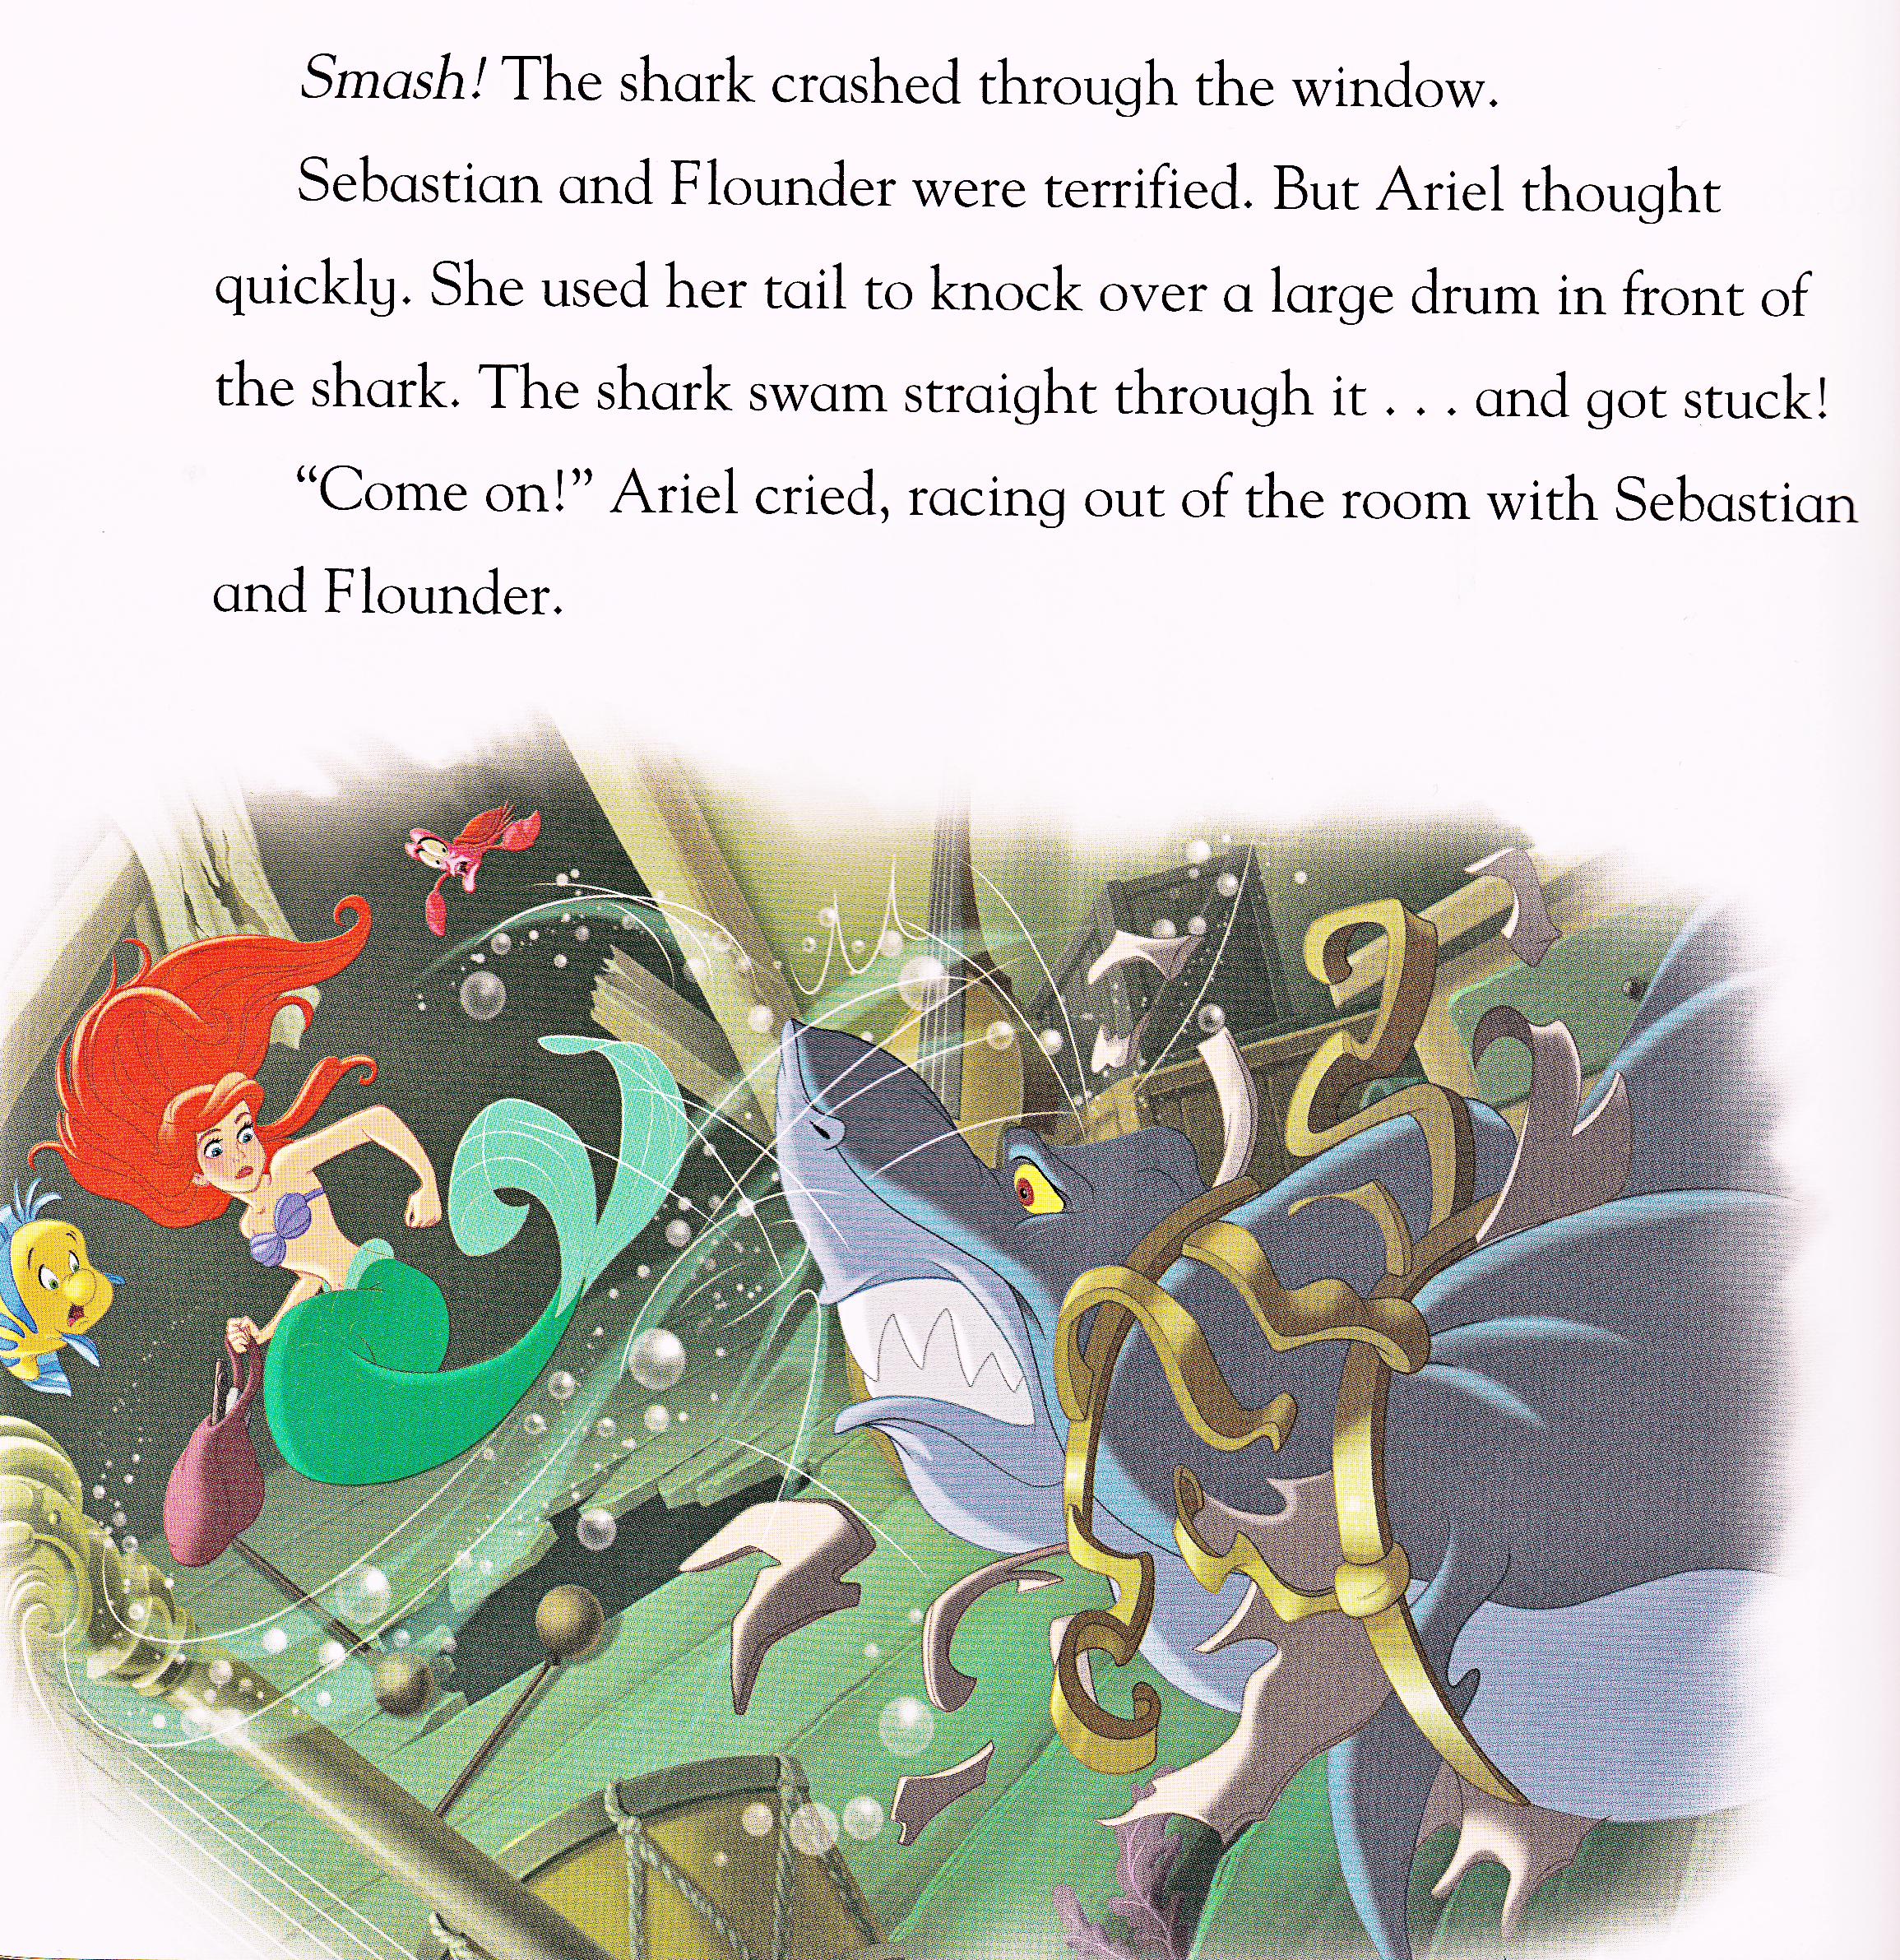 Walt Disney Book Scans - The Little Mermaid: haai Surprise (English Version)